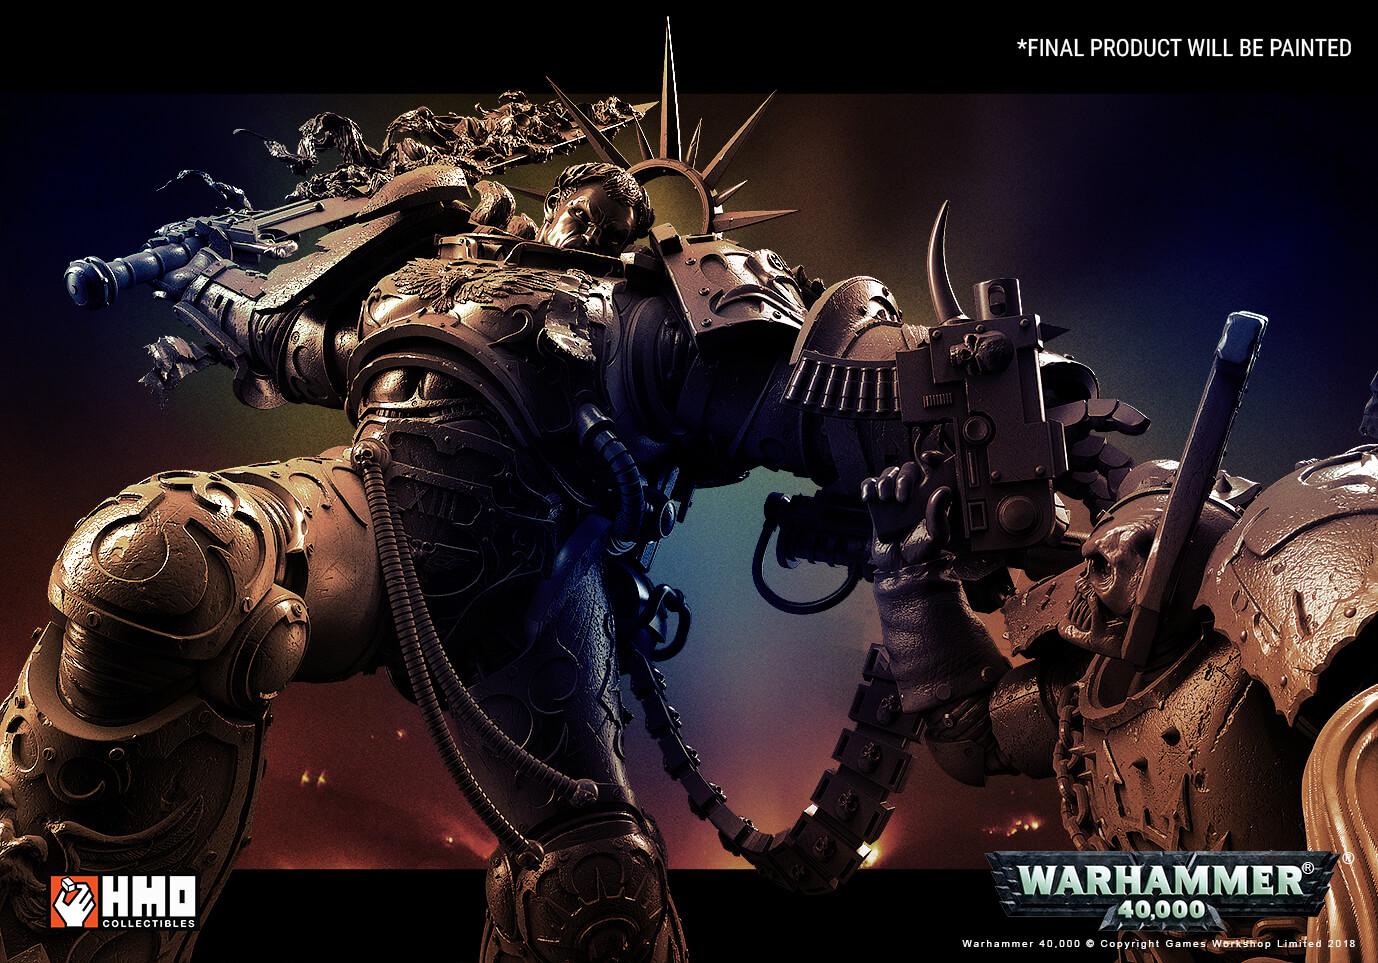 HMO's Warhammer 40,000: Guilliman vs Chaos Marine Diorama